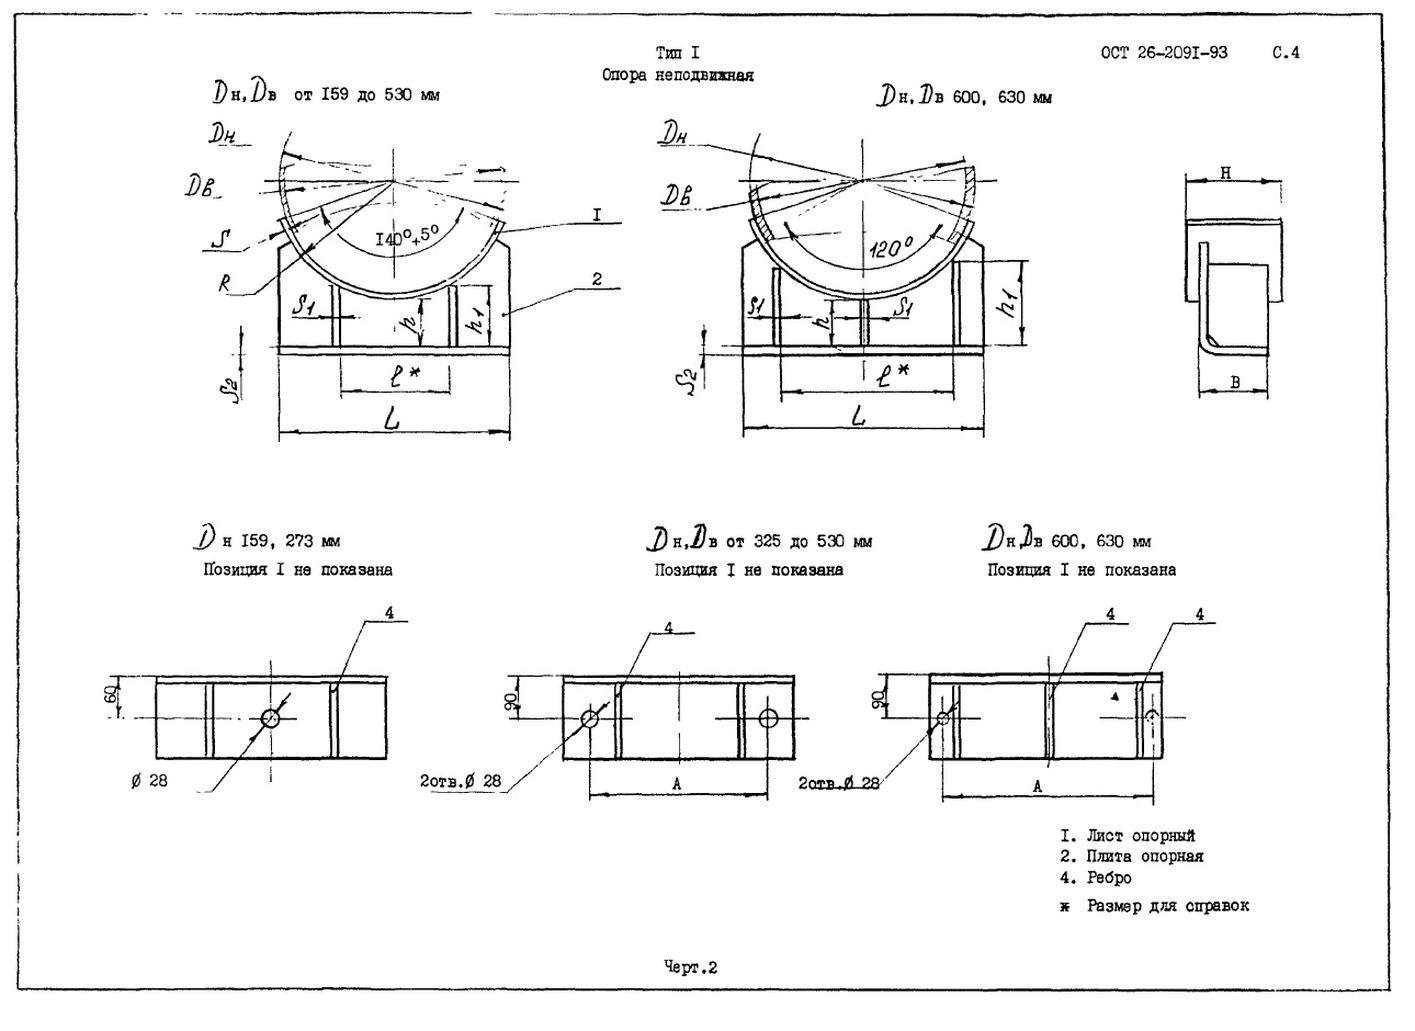 Опоры тип 1 ОСТ 26-2091-93 стр.2